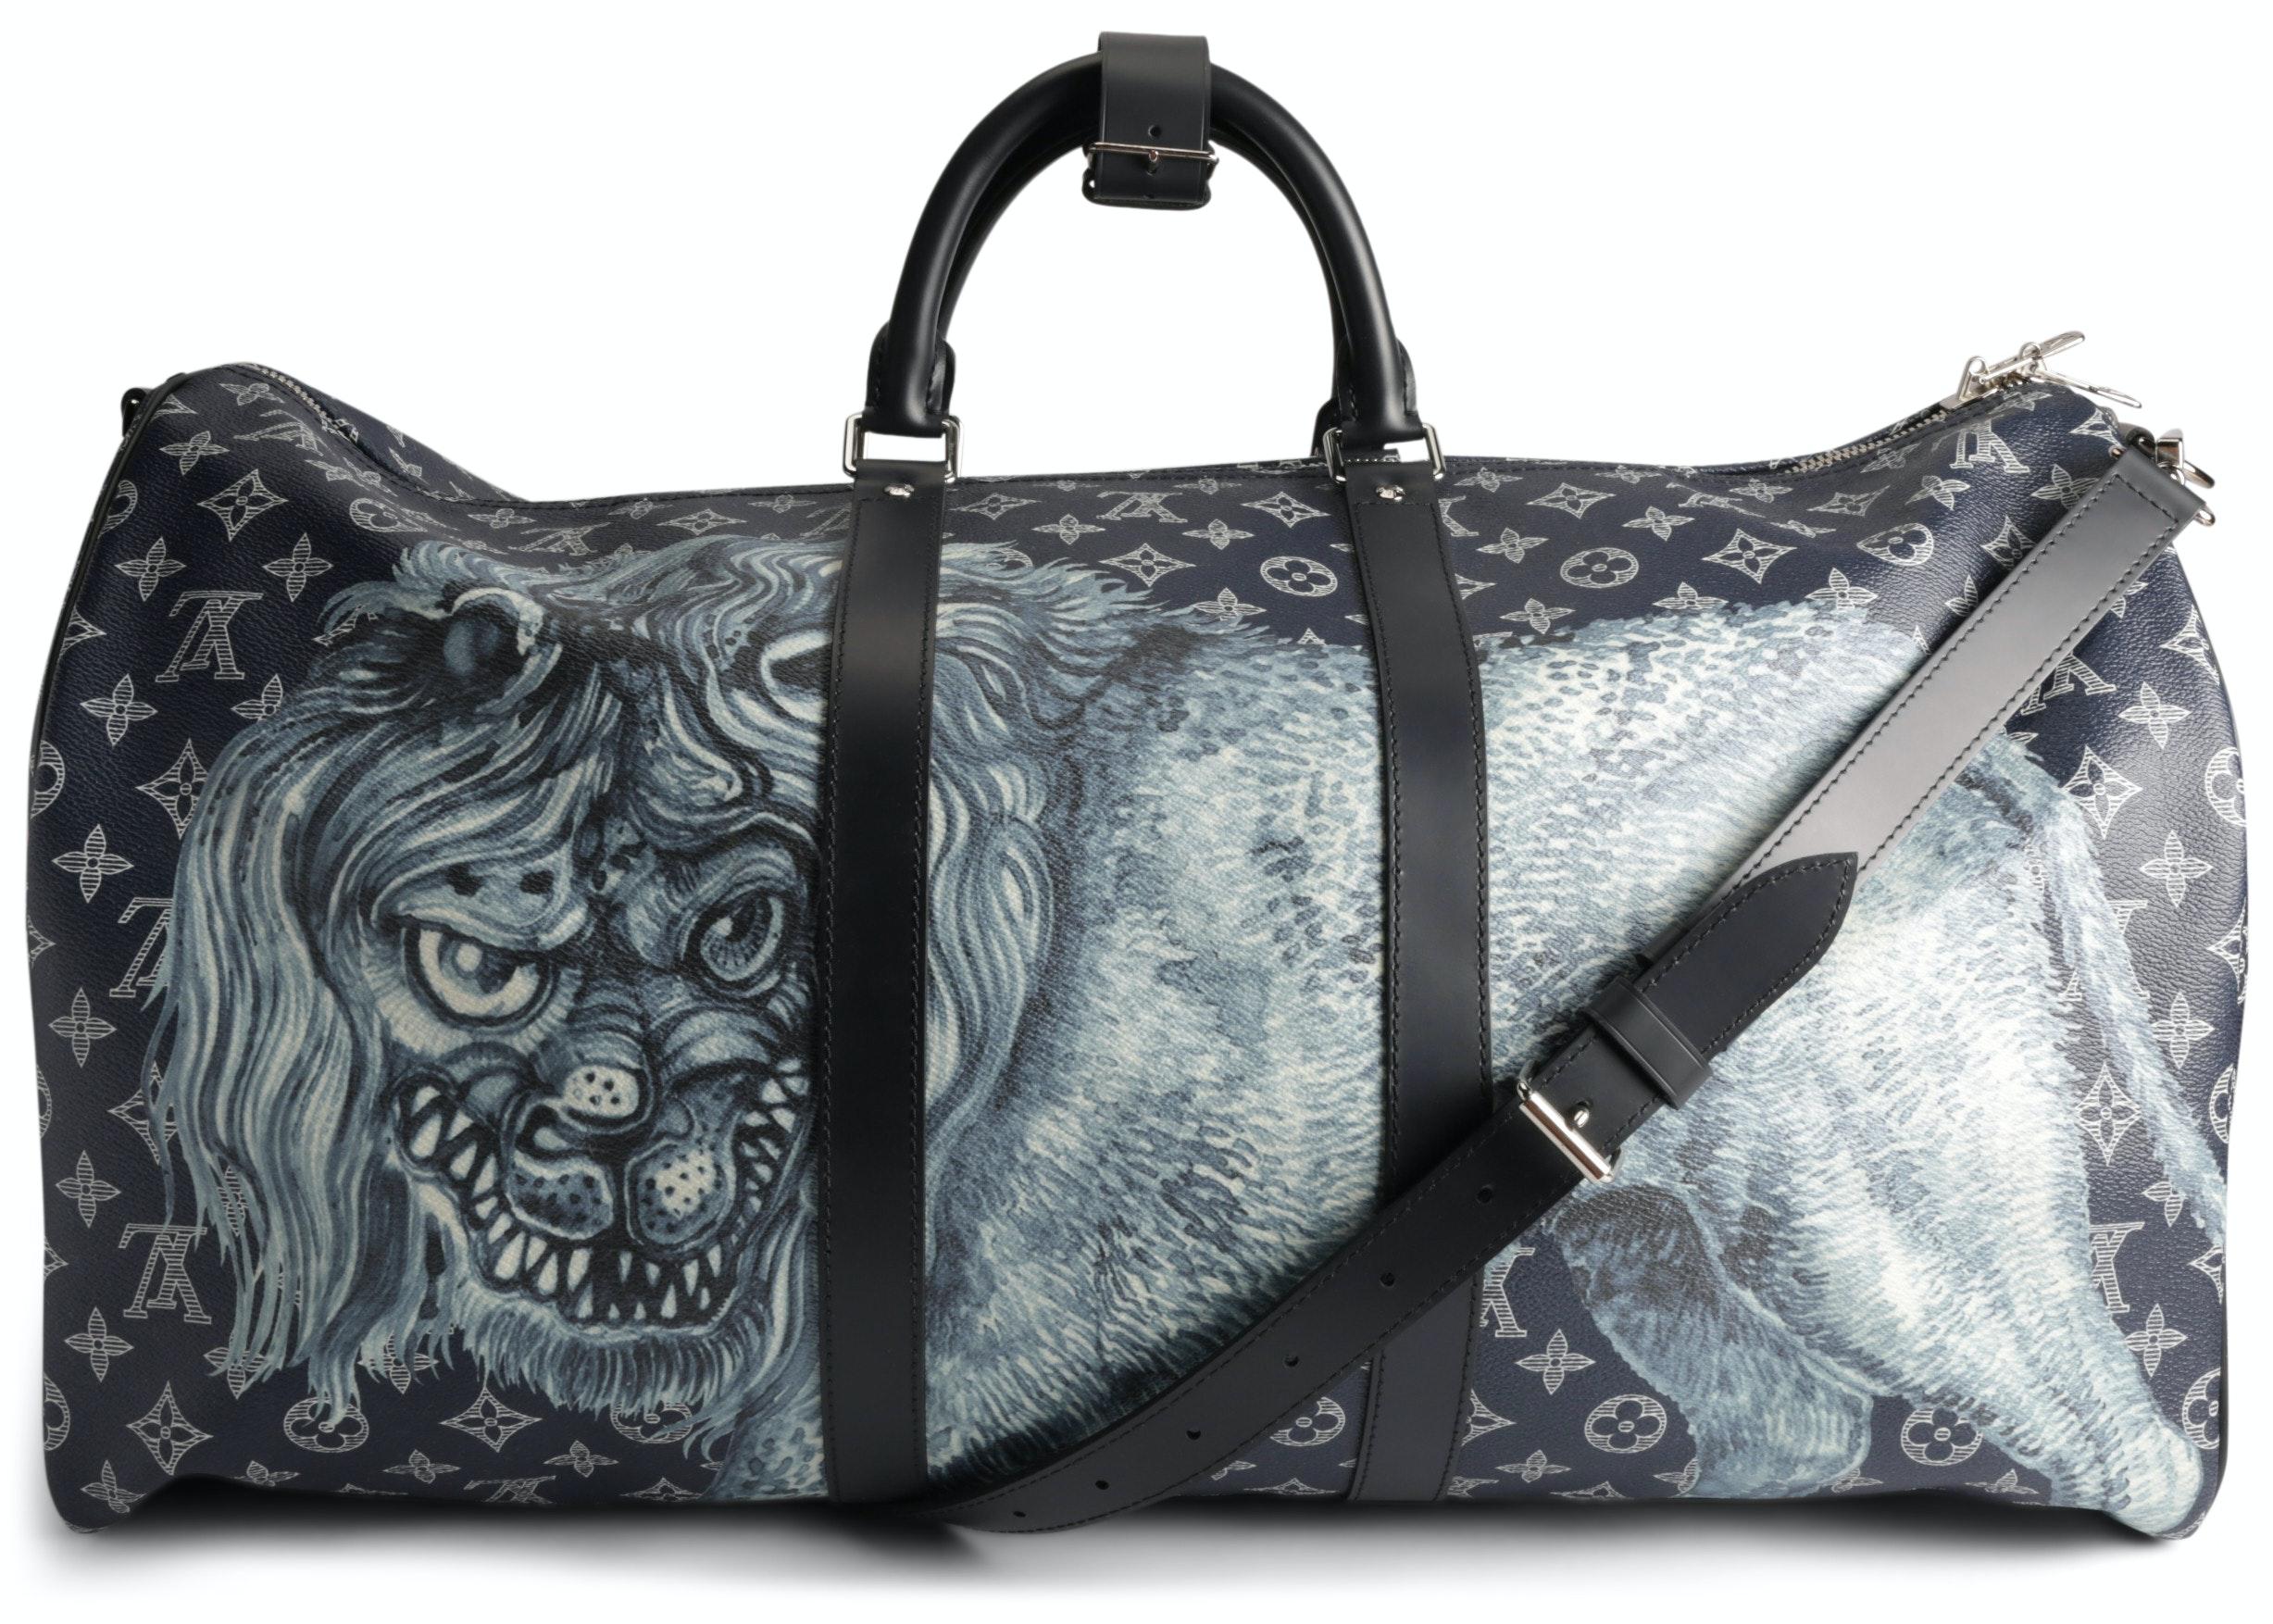 Louis Vuitton Duffle Keepall Bandouliere Savane Monogram Chapman Lion Motif (With Accessories) 55